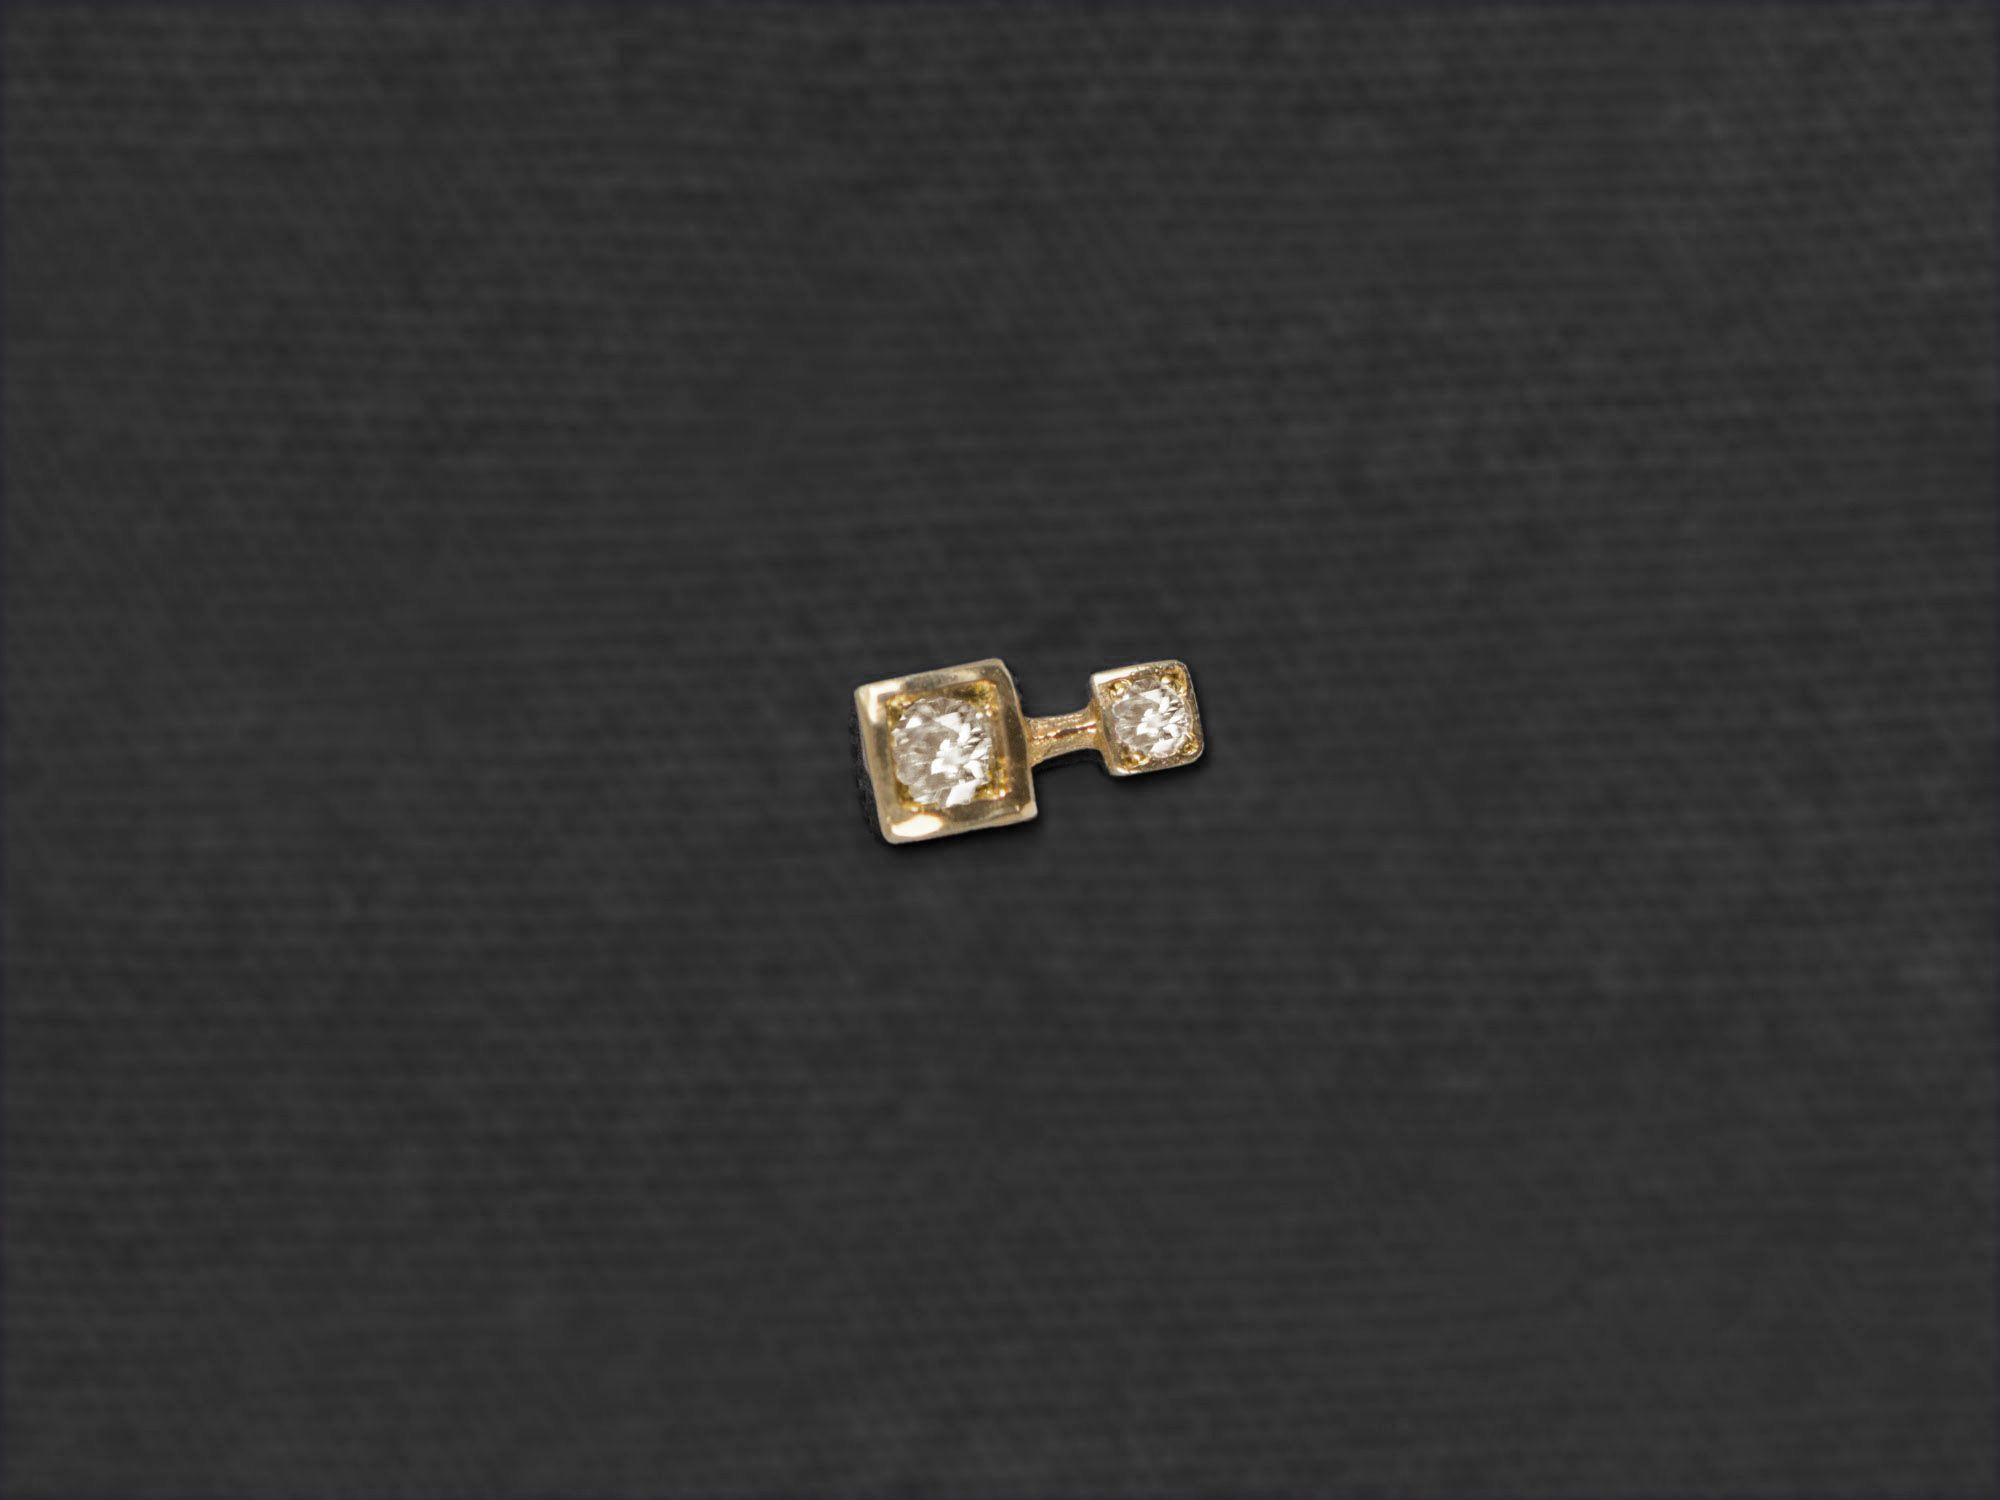 Andromede stud earring by Emmanuelle Zysman